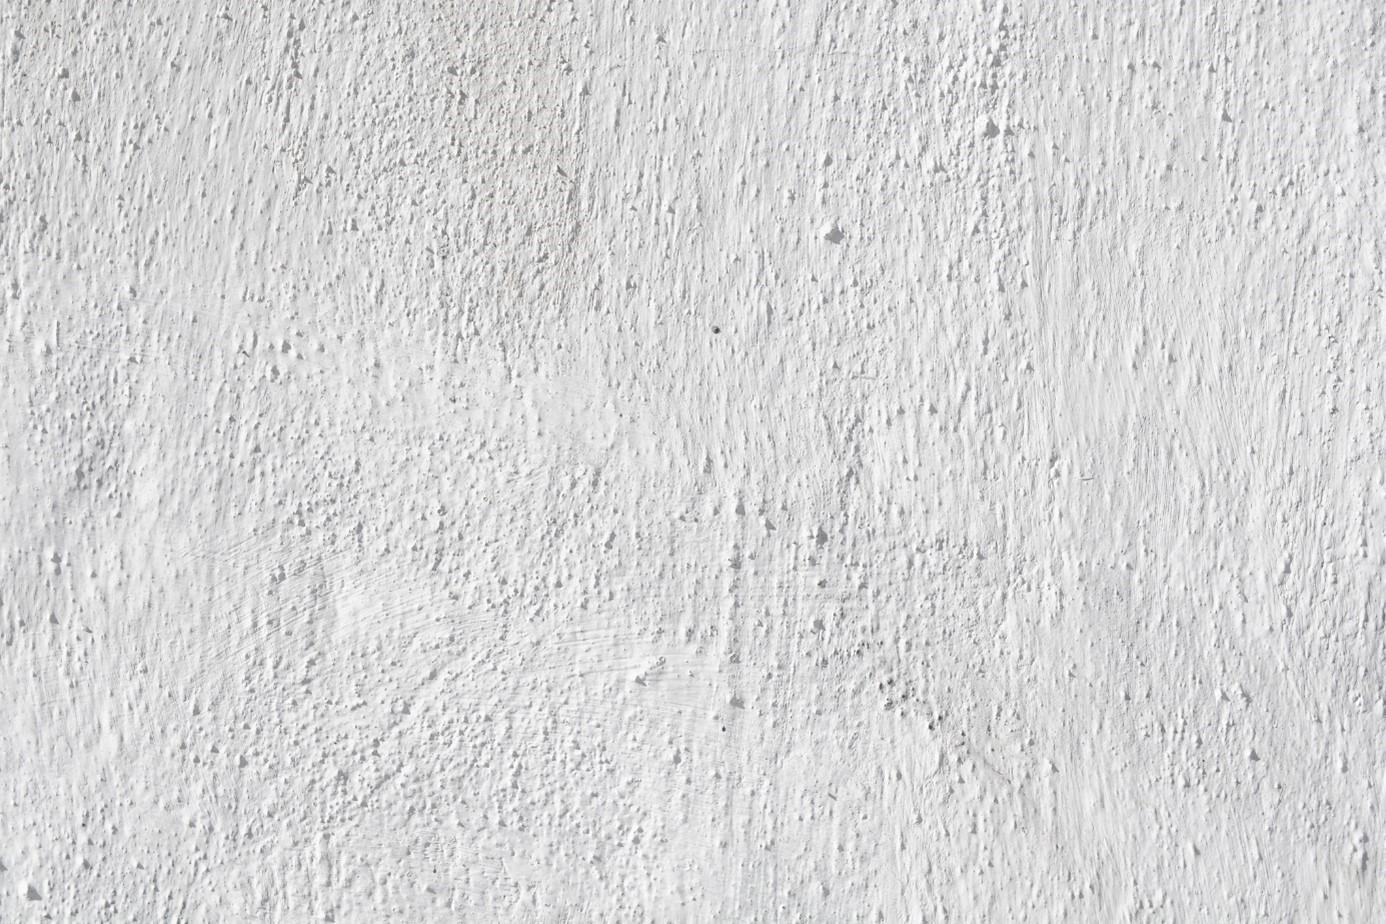 Mur En Crépi